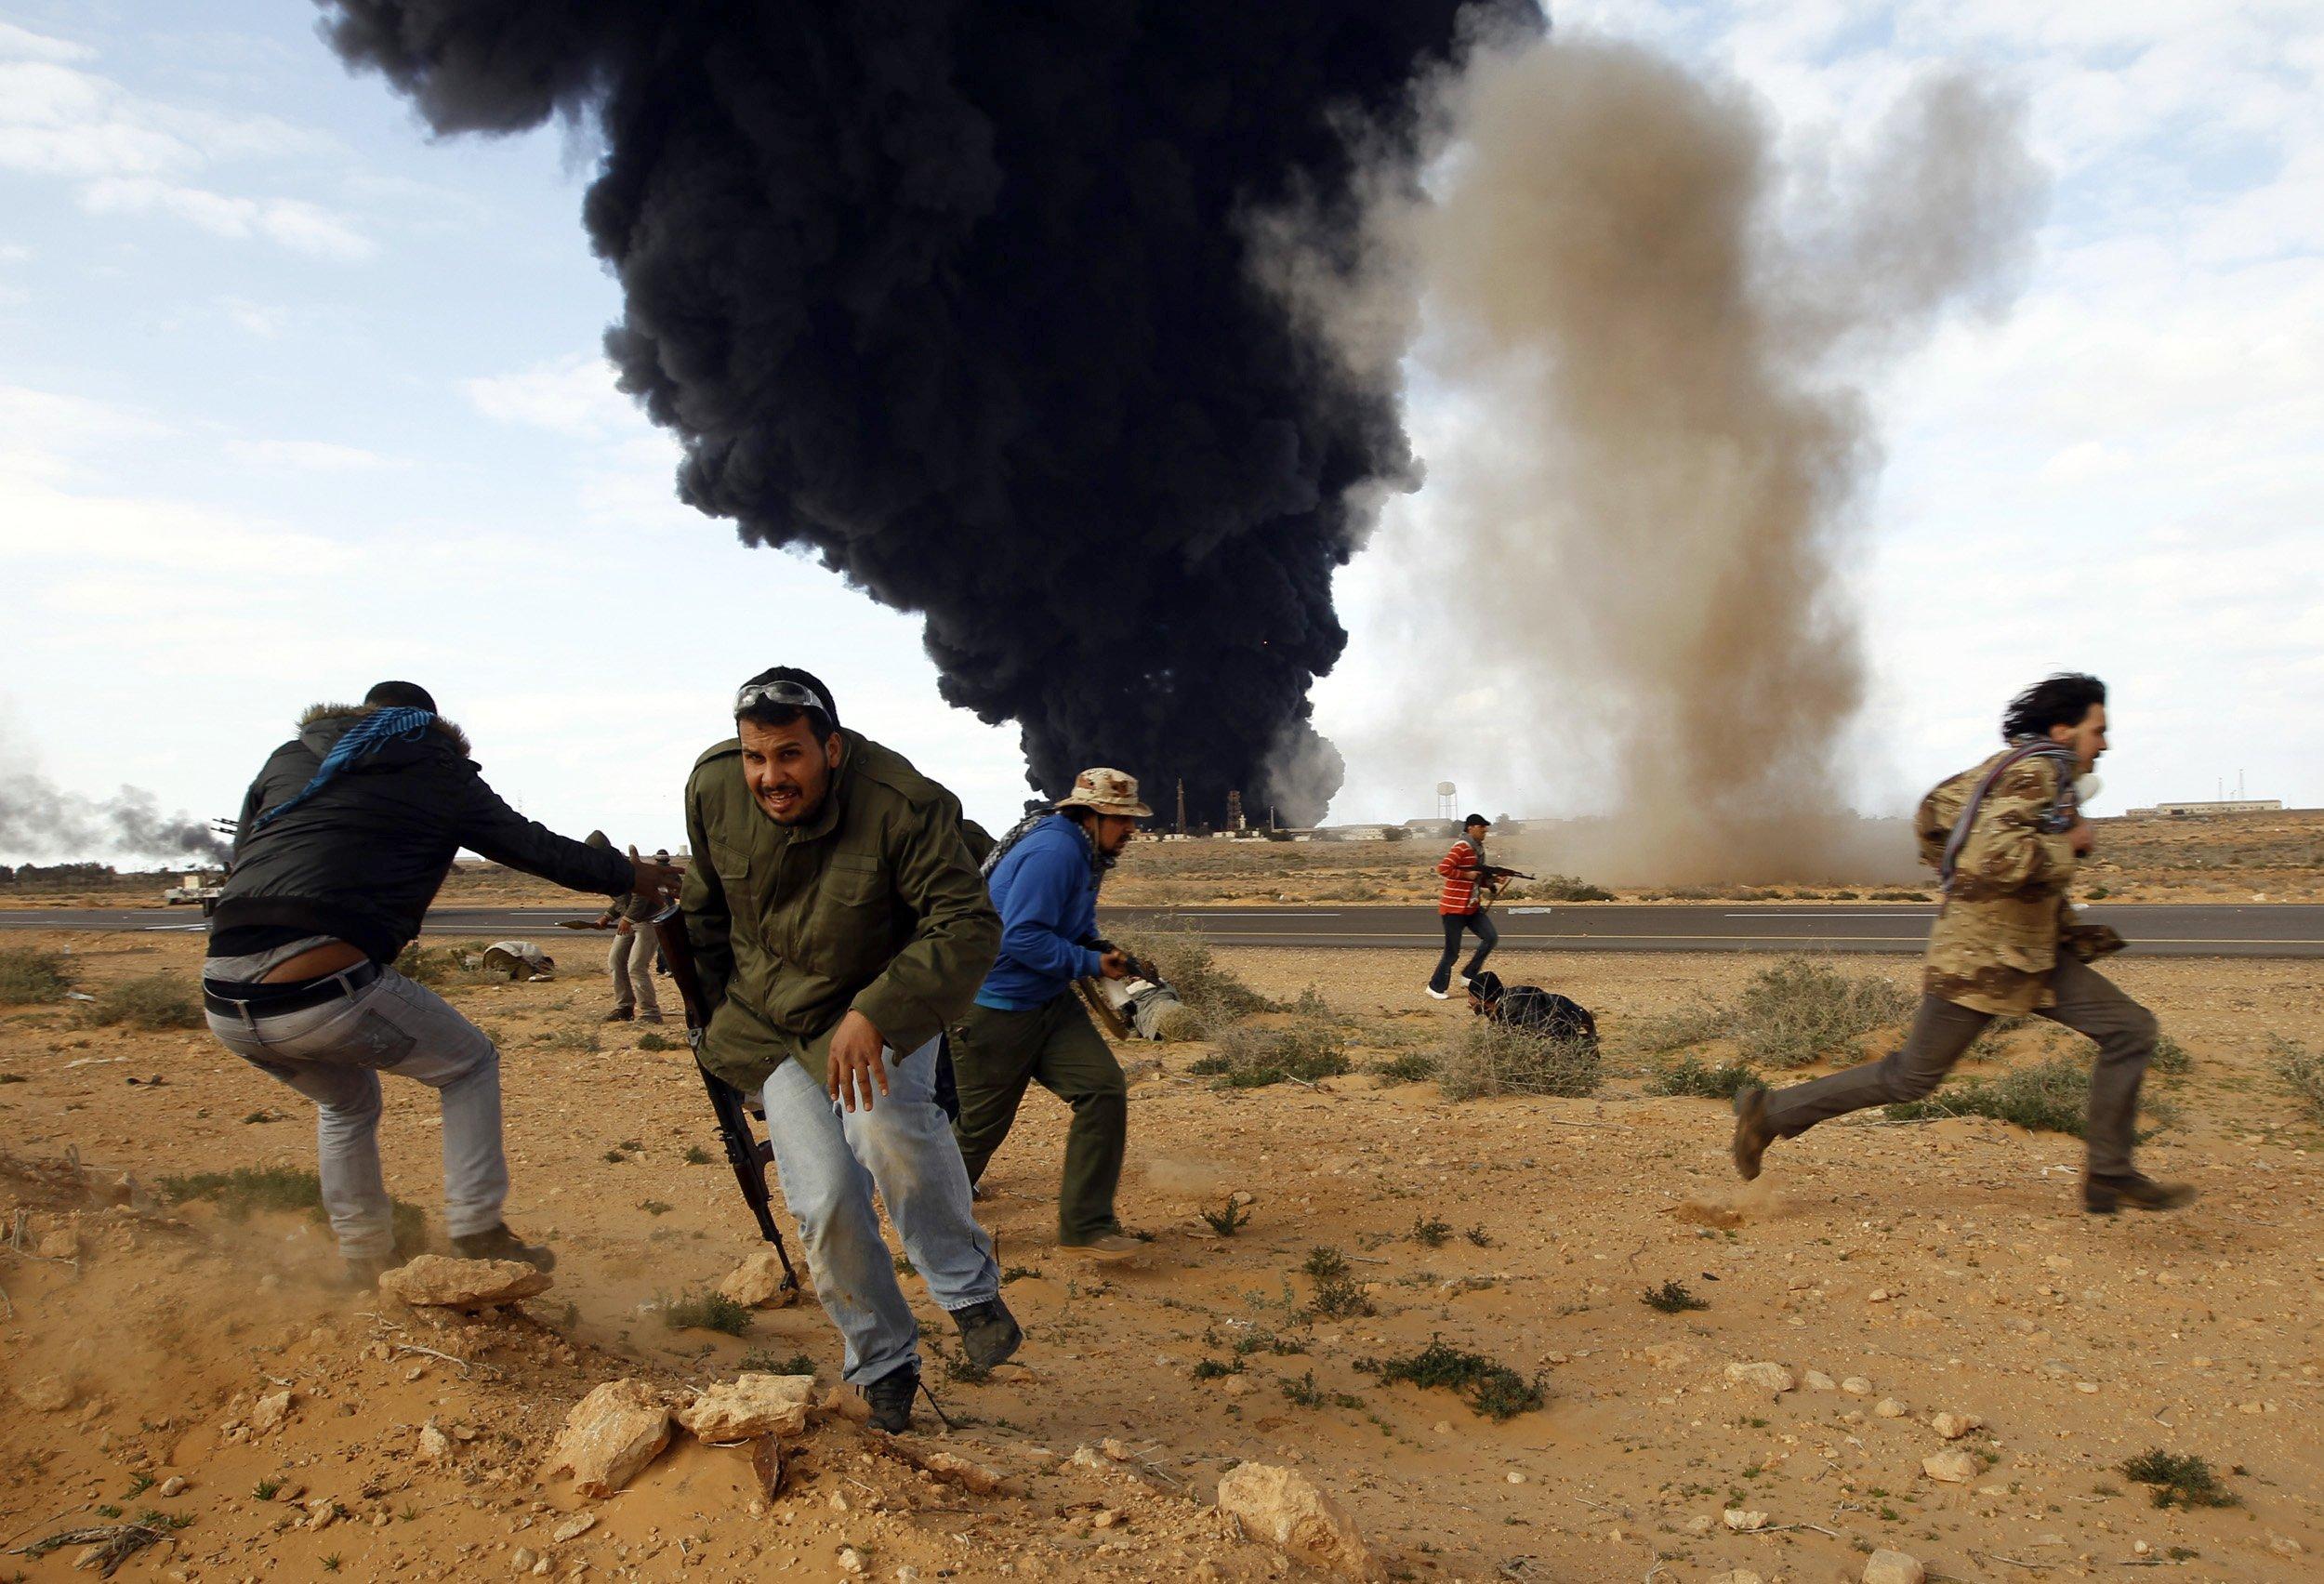 07_08_Libya_03